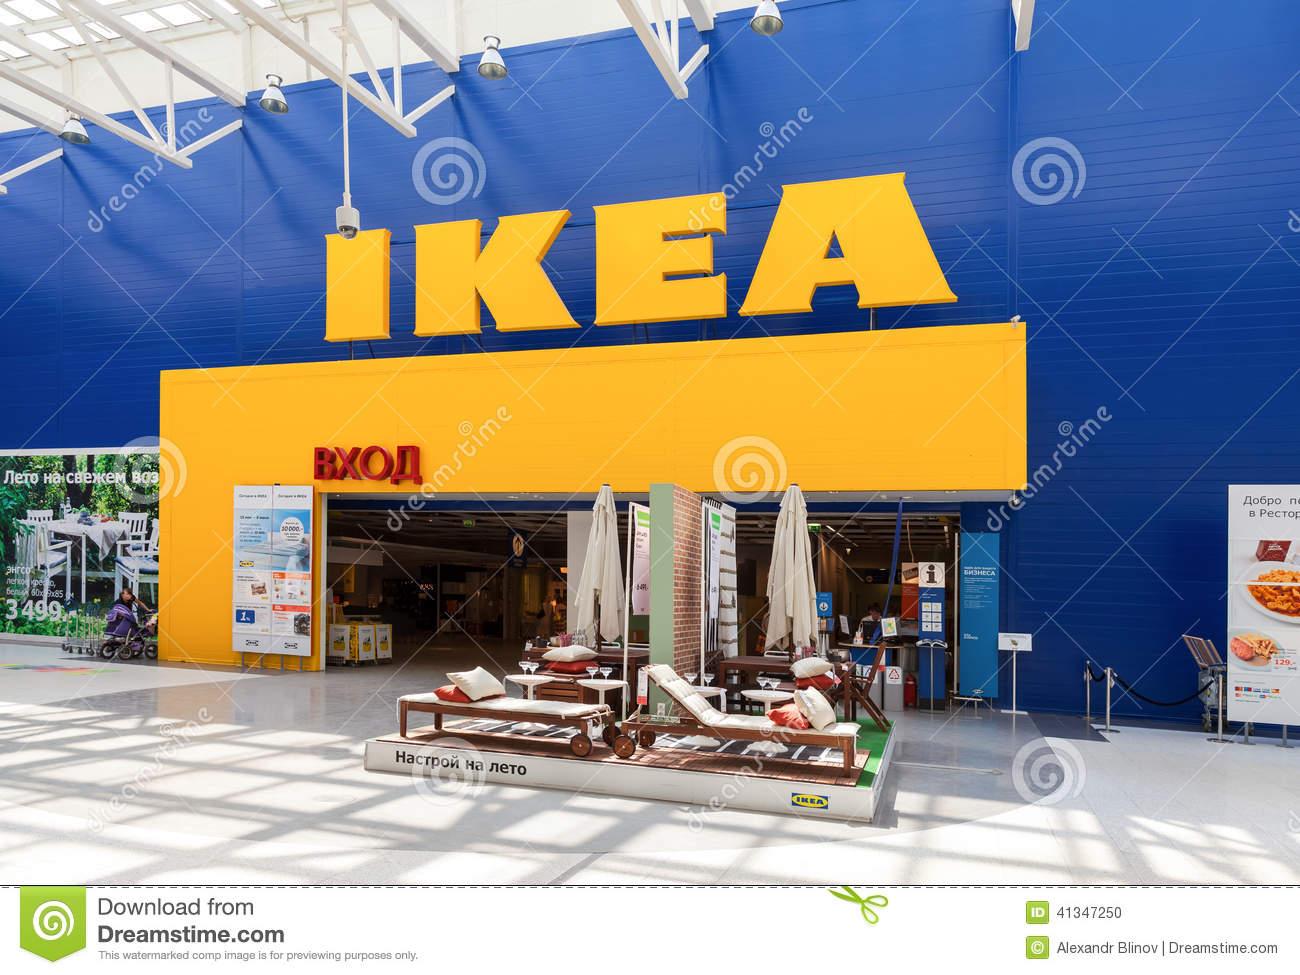 Ikea clipart.